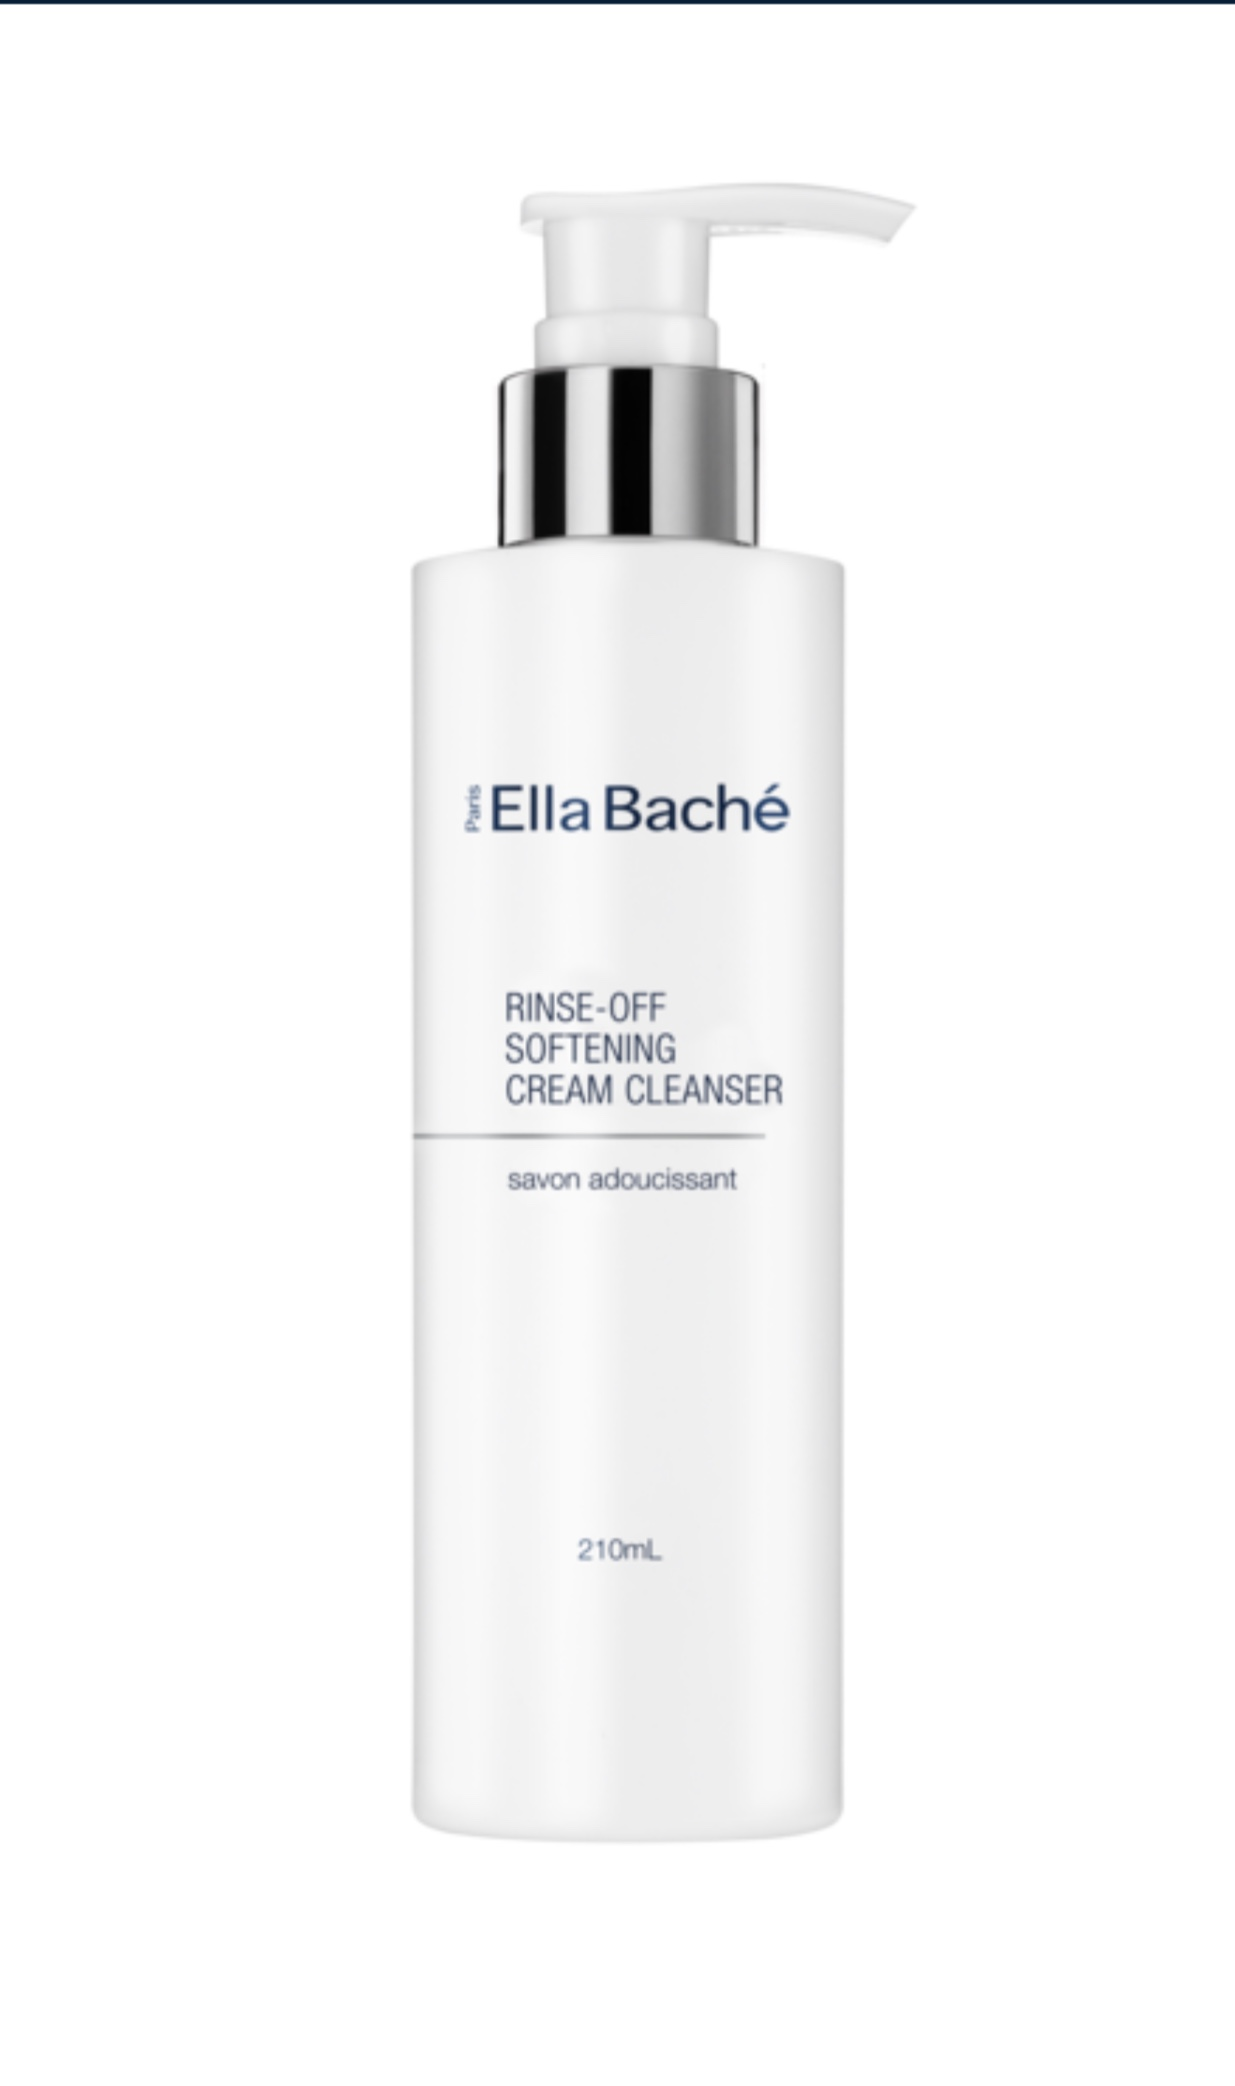 Ella Baché Rinse-Off Softening Cream Cleanser (Savon Adoucissant)